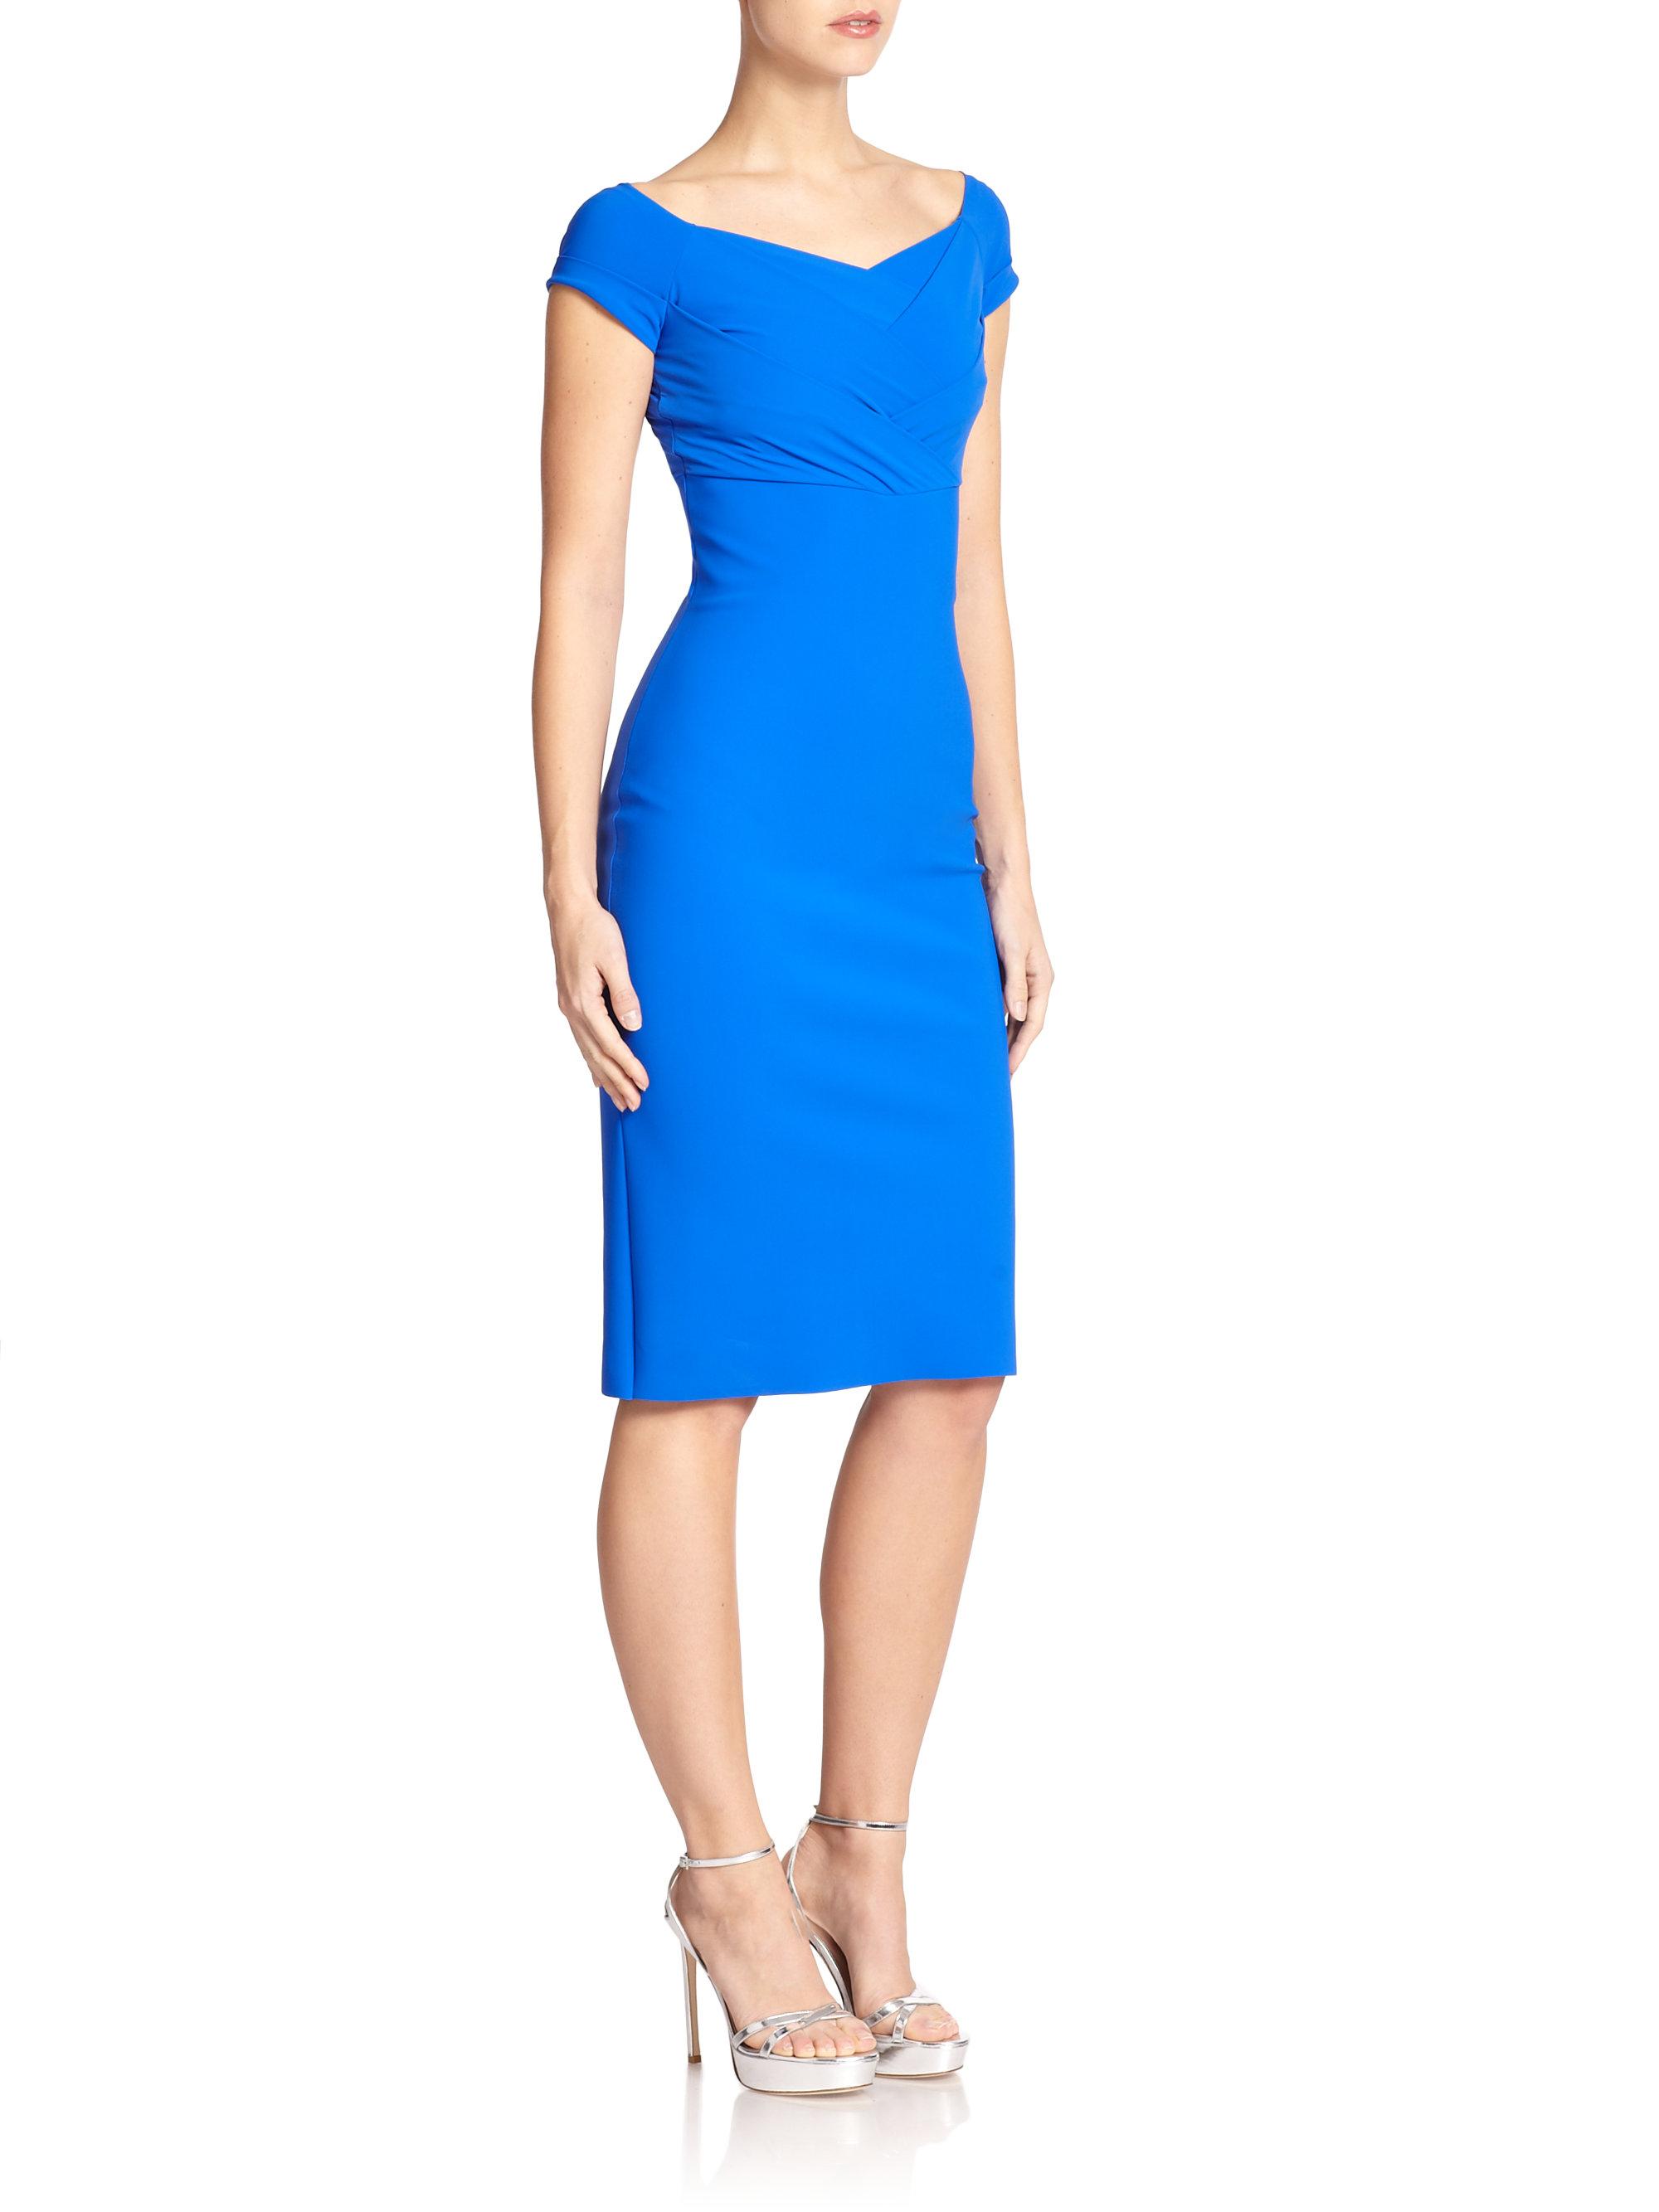 la petite robe di chiara boni off the shoulder sheath dress in blue lyst. Black Bedroom Furniture Sets. Home Design Ideas